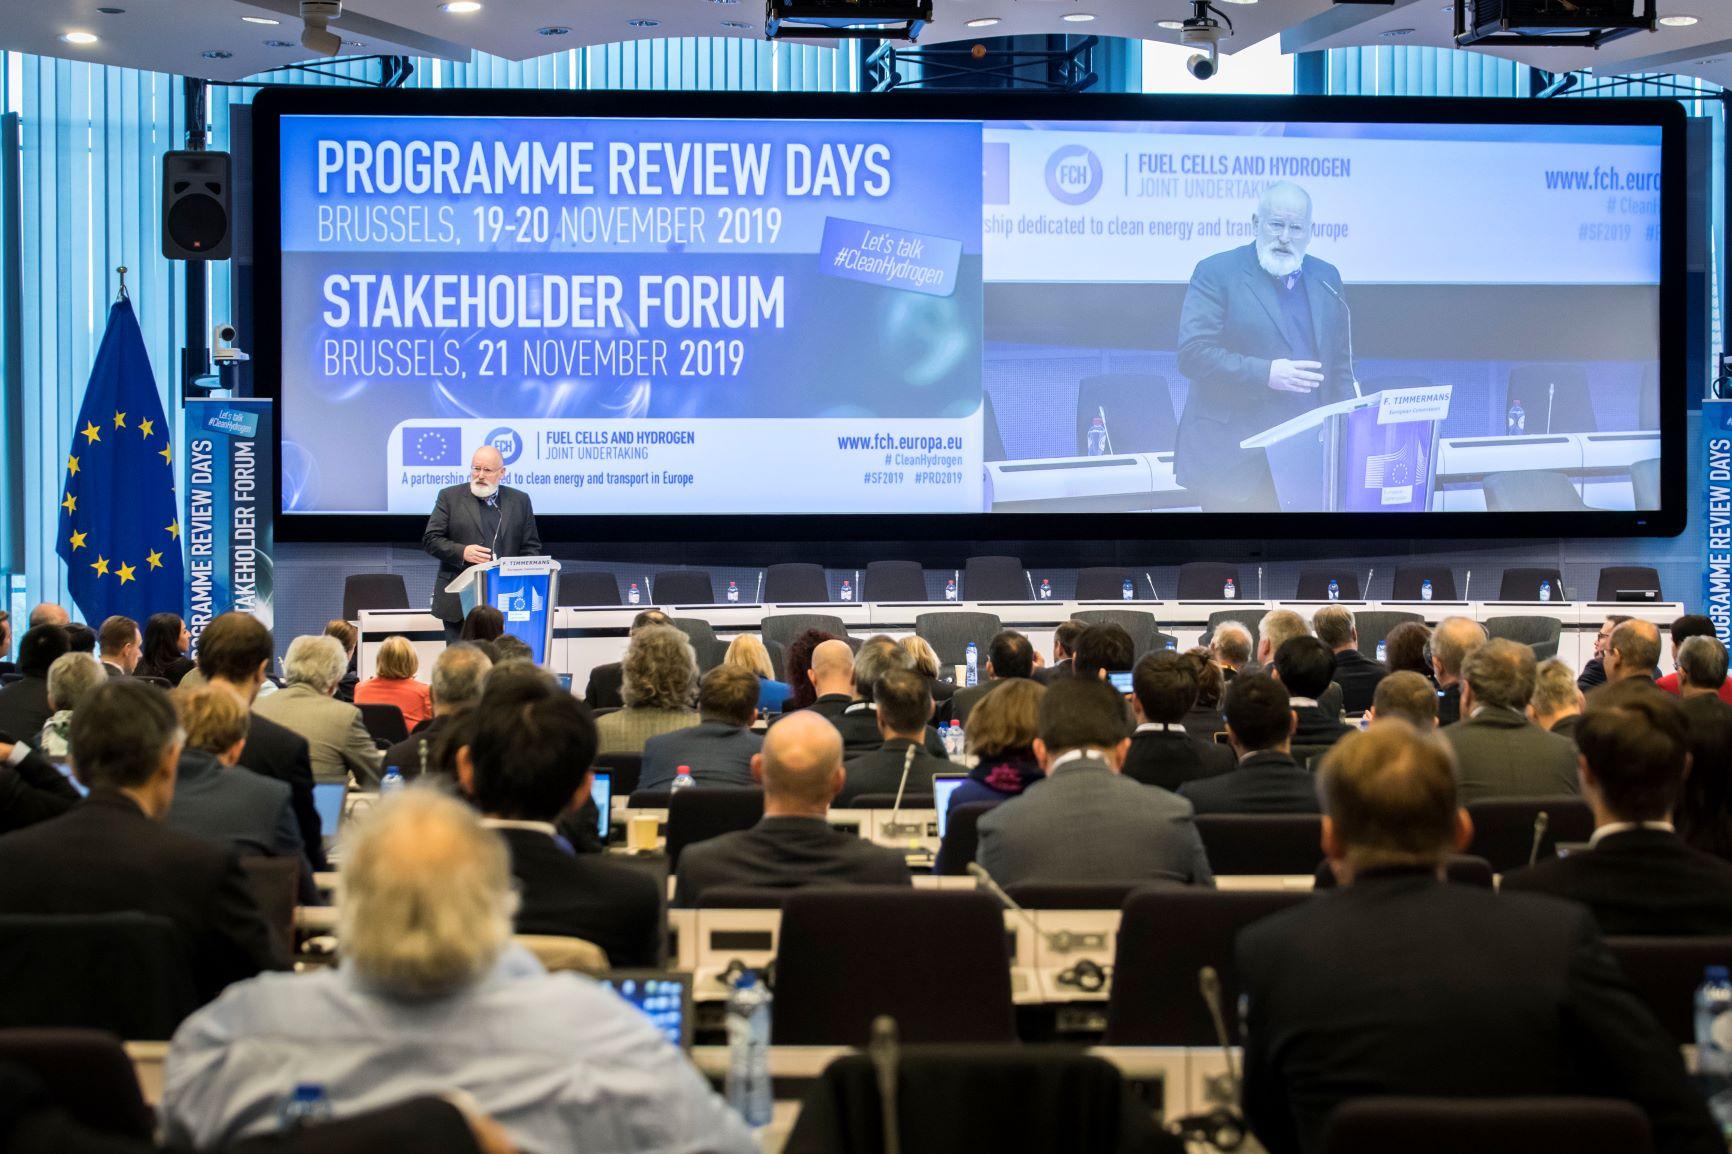 Stakholders Forum FCHJU